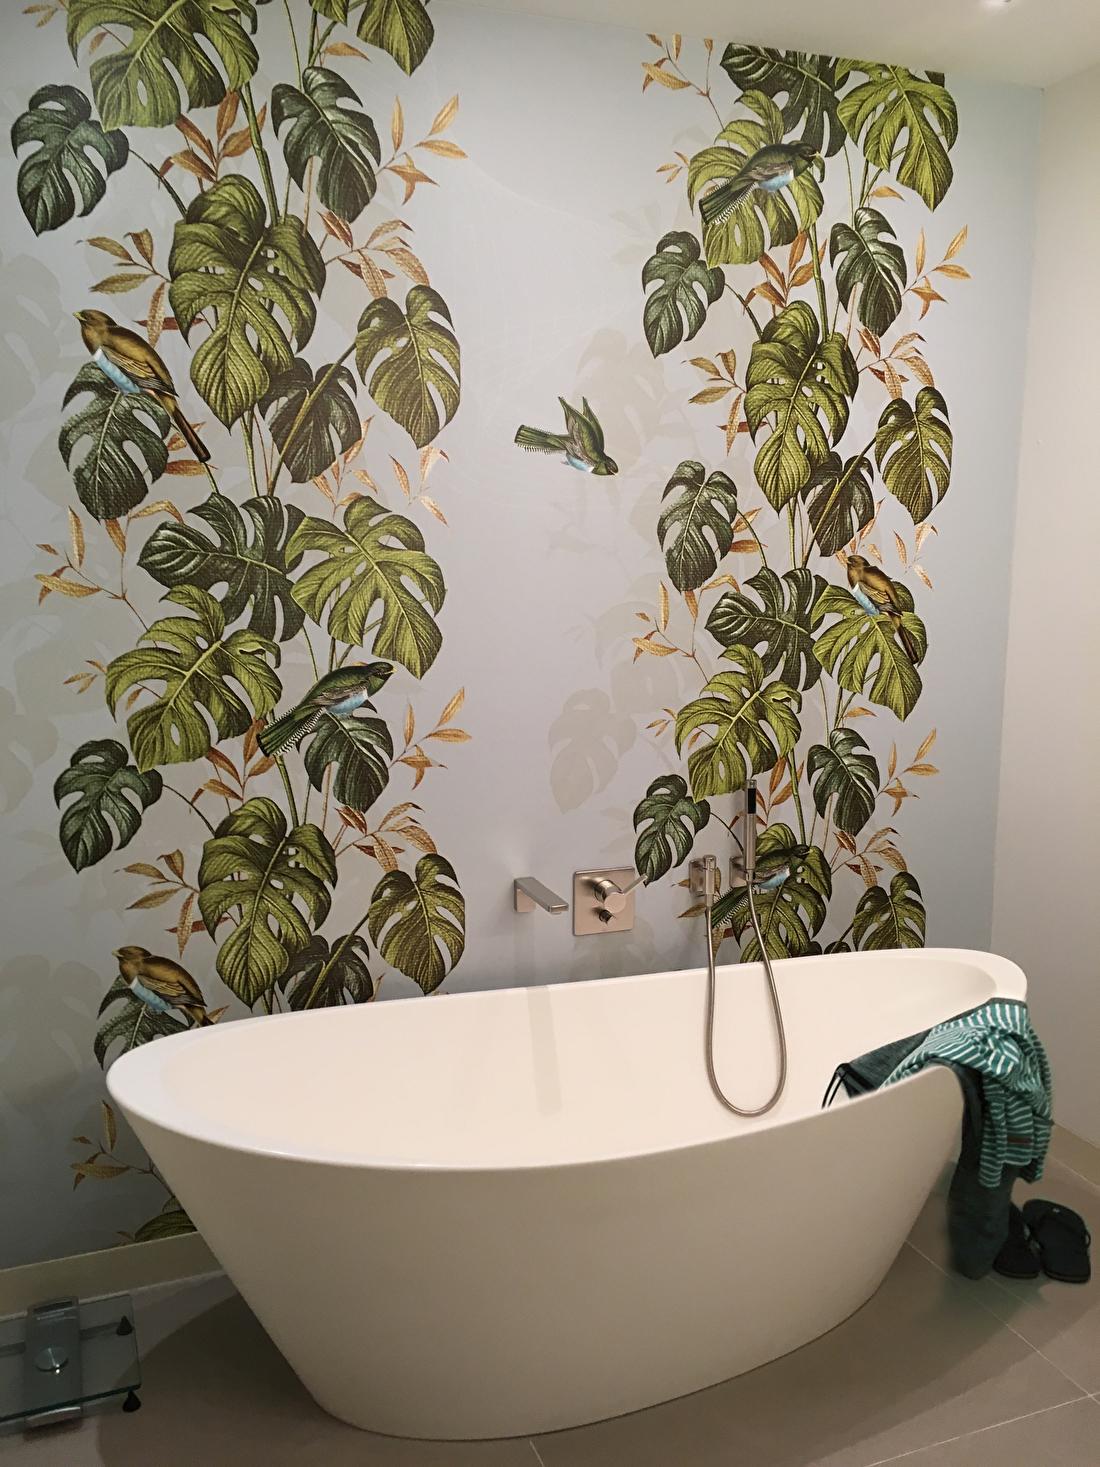 dutch dahlia's design wallpaper saskia van der linden